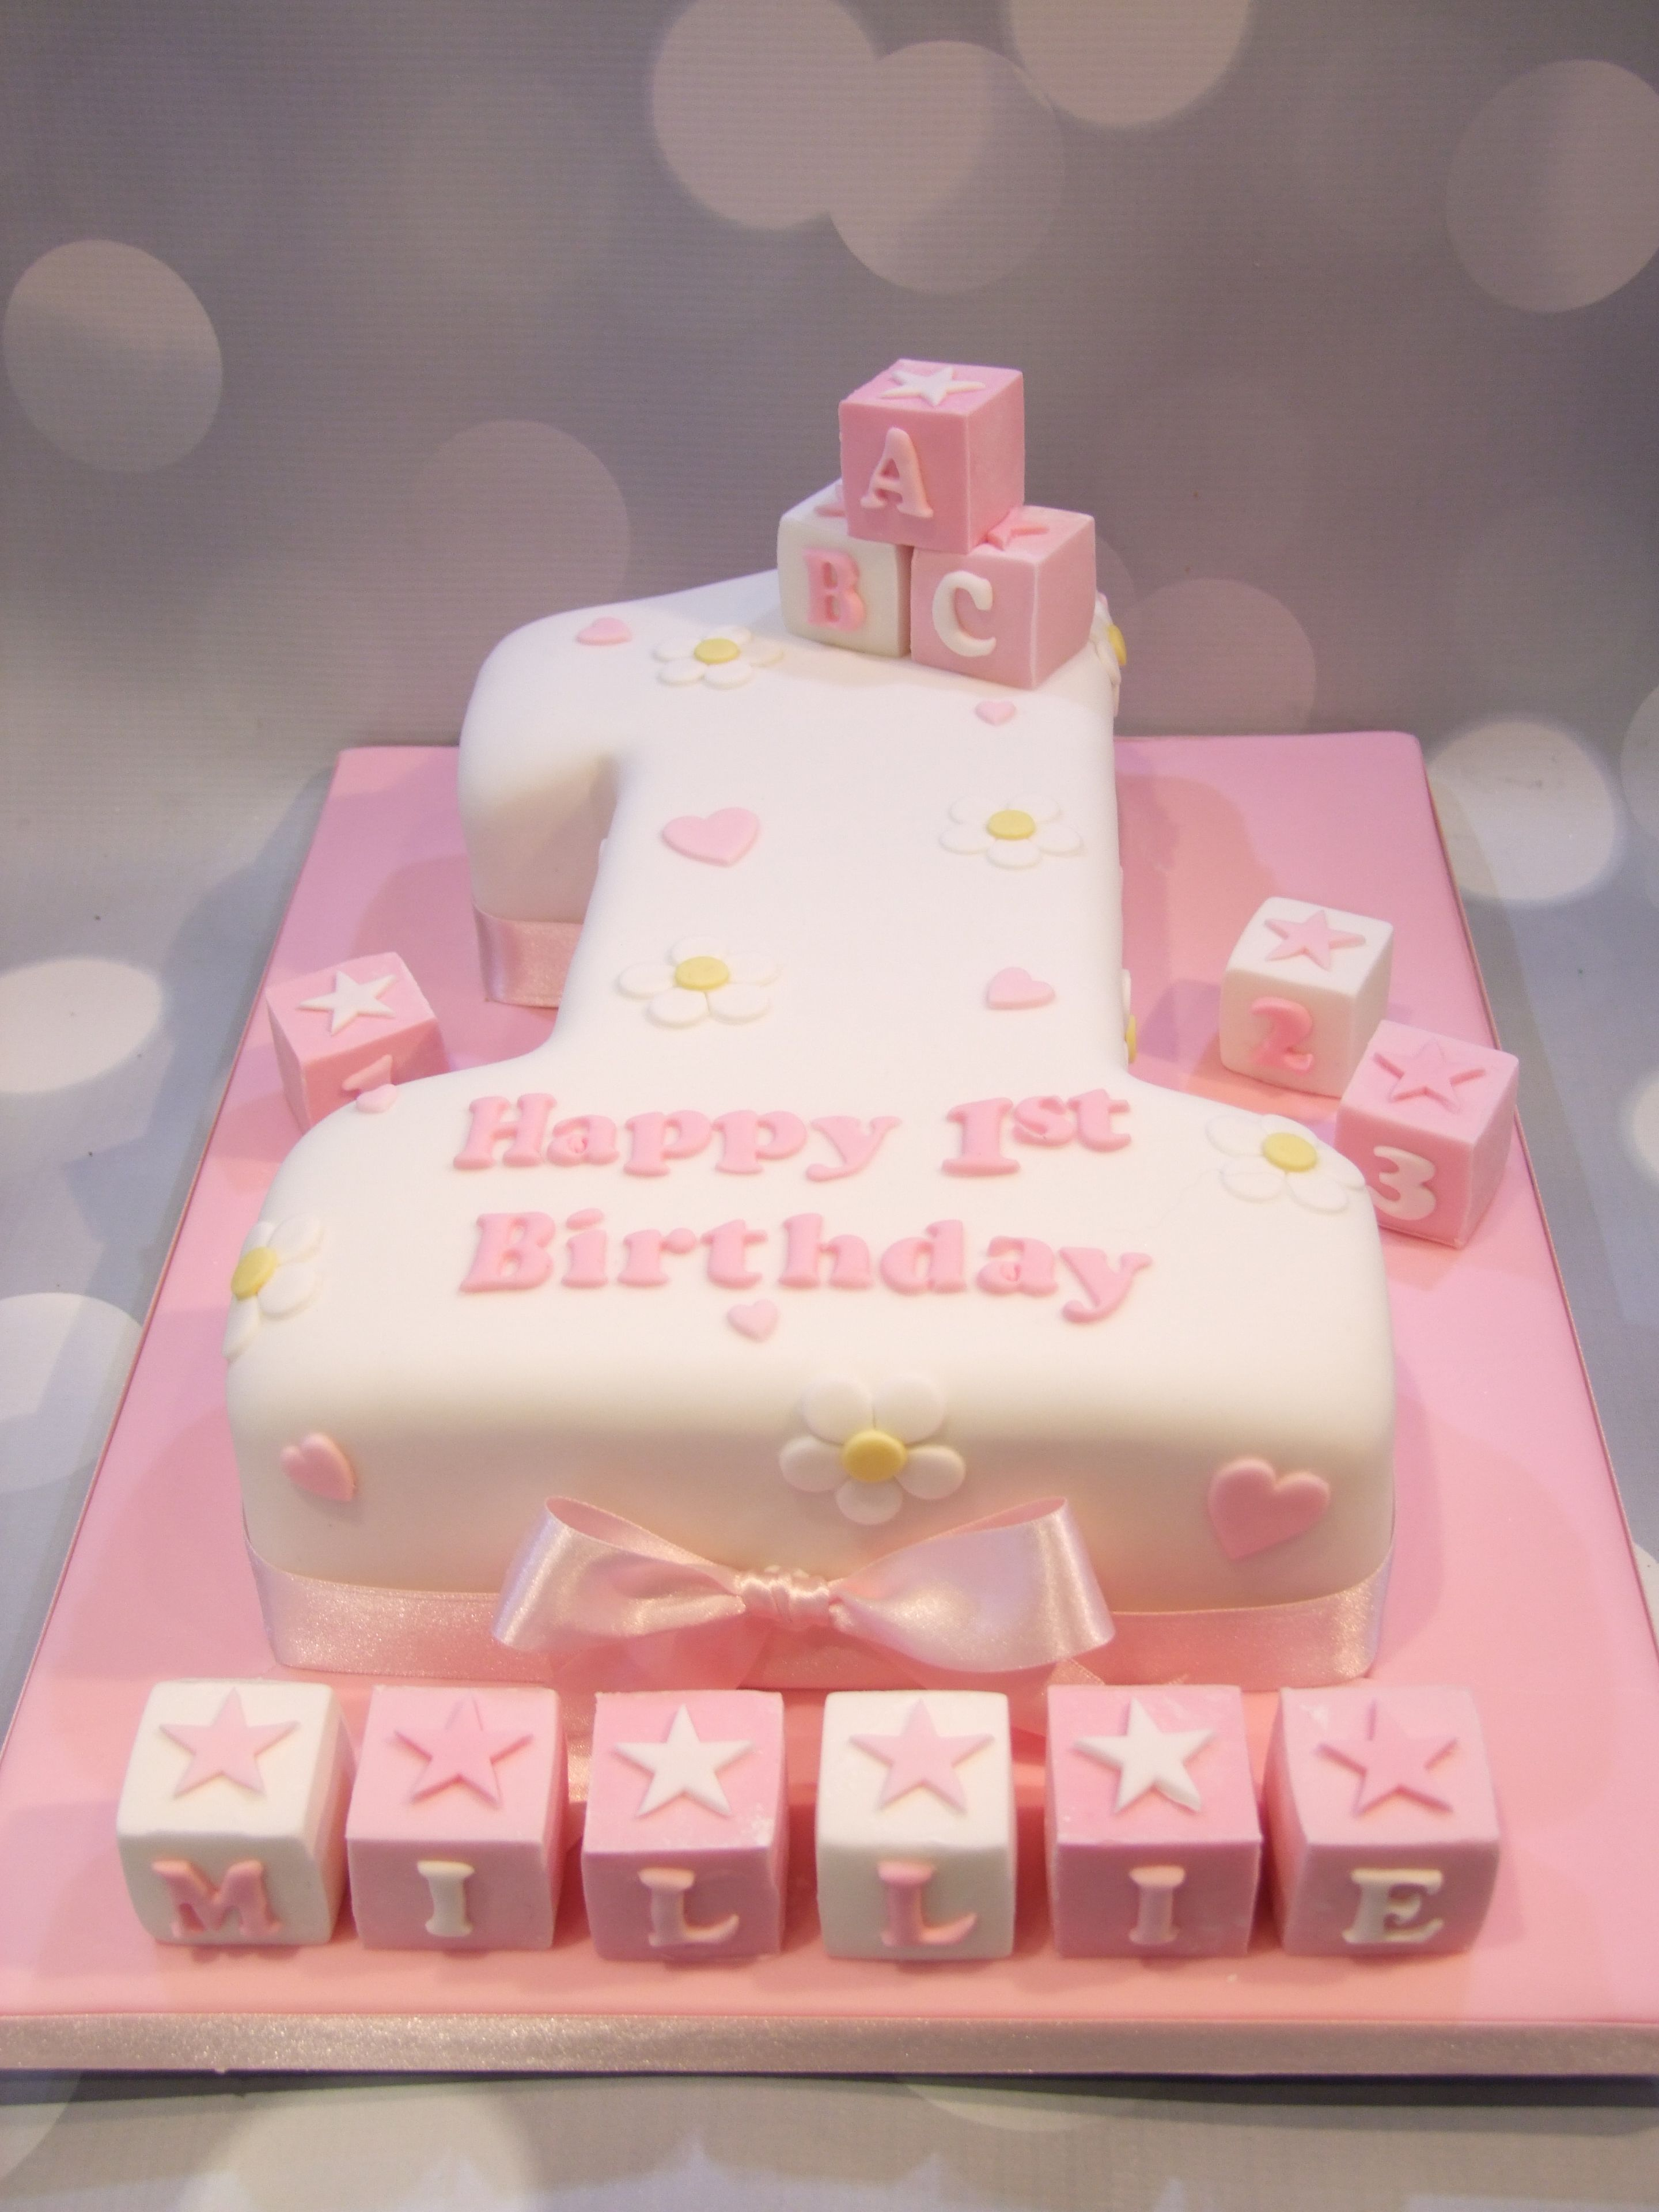 Magnificent No 1 Birthday Bricks Cake With Images 1St Birthday Cake For Personalised Birthday Cards Beptaeletsinfo